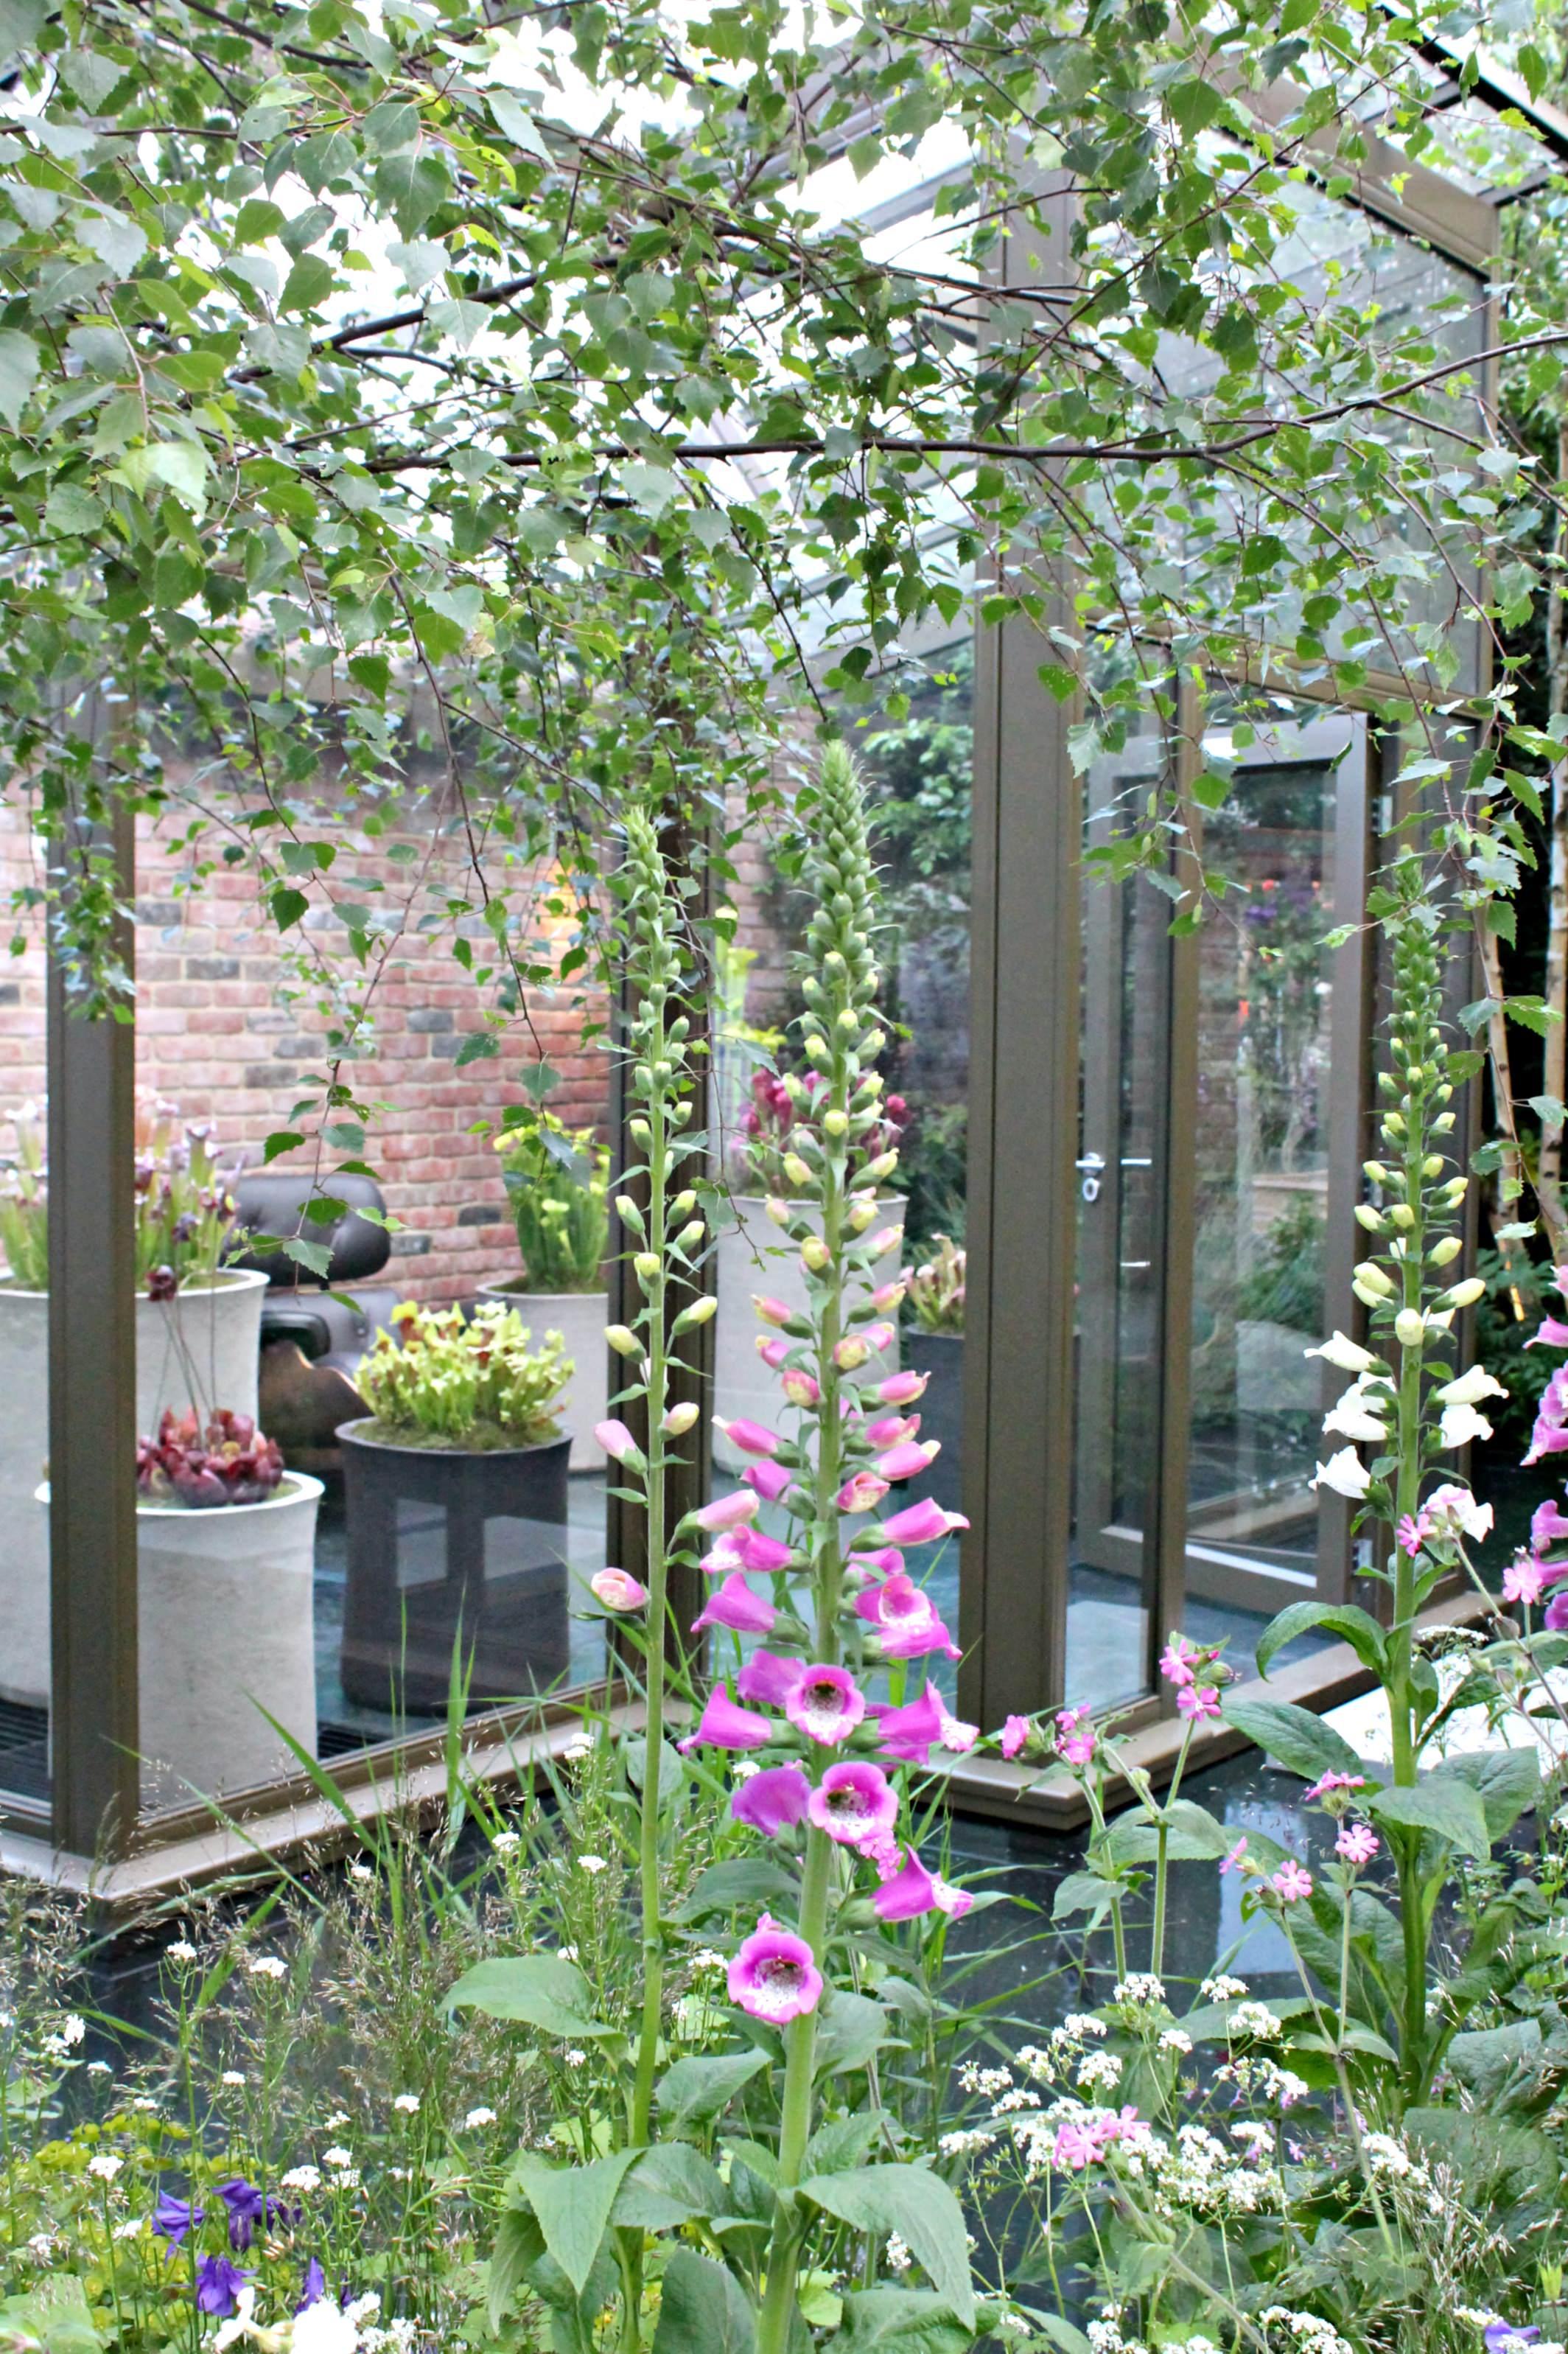 The-Hartley-Botanic-garden-Chelsea-Flower-show-photo-by-Geraldine-Tan-Little-Big-Bell